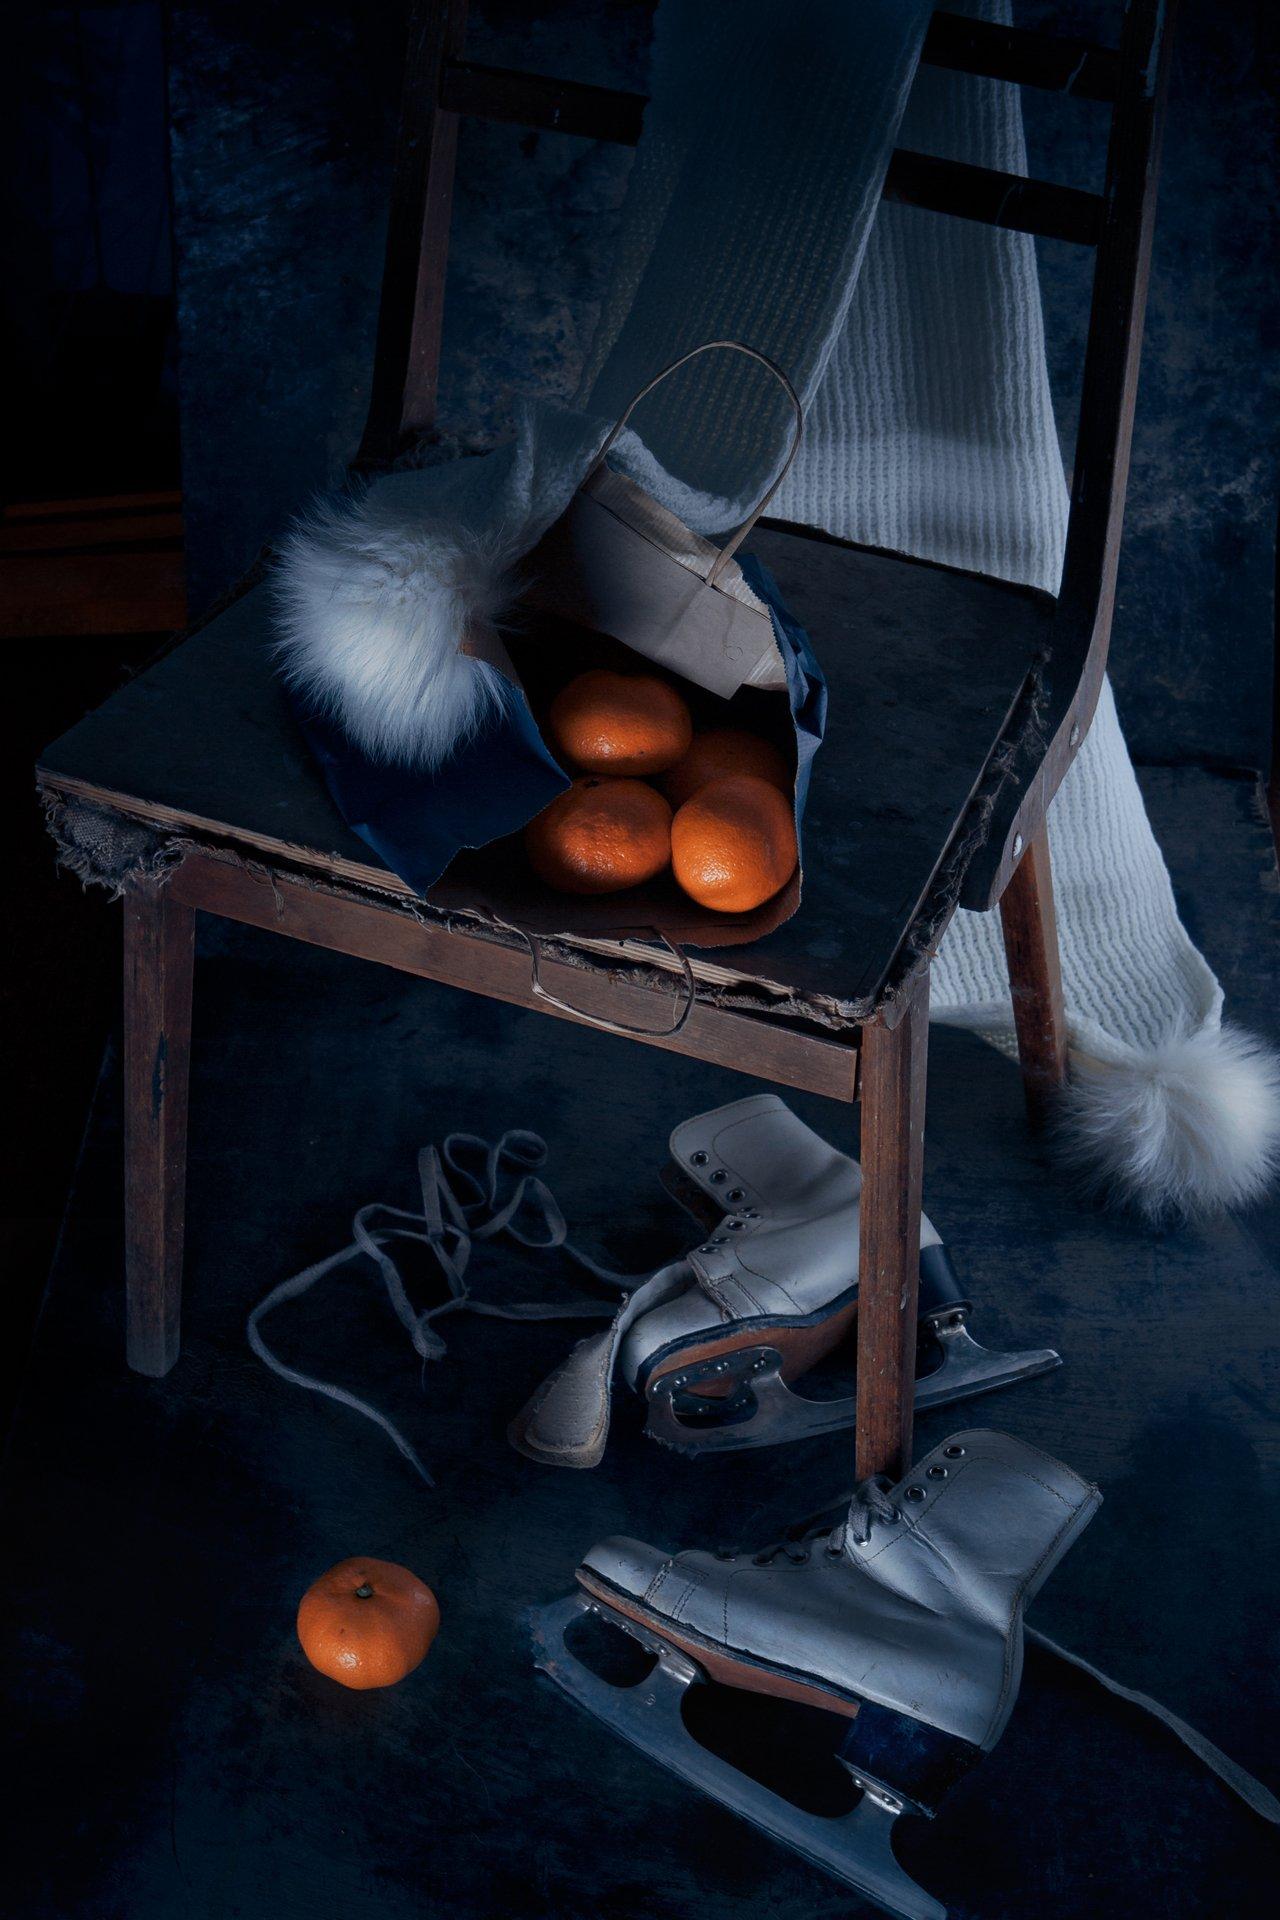 мандарины, коньки, шарф, натюрморт, зима , Наталья Голубева